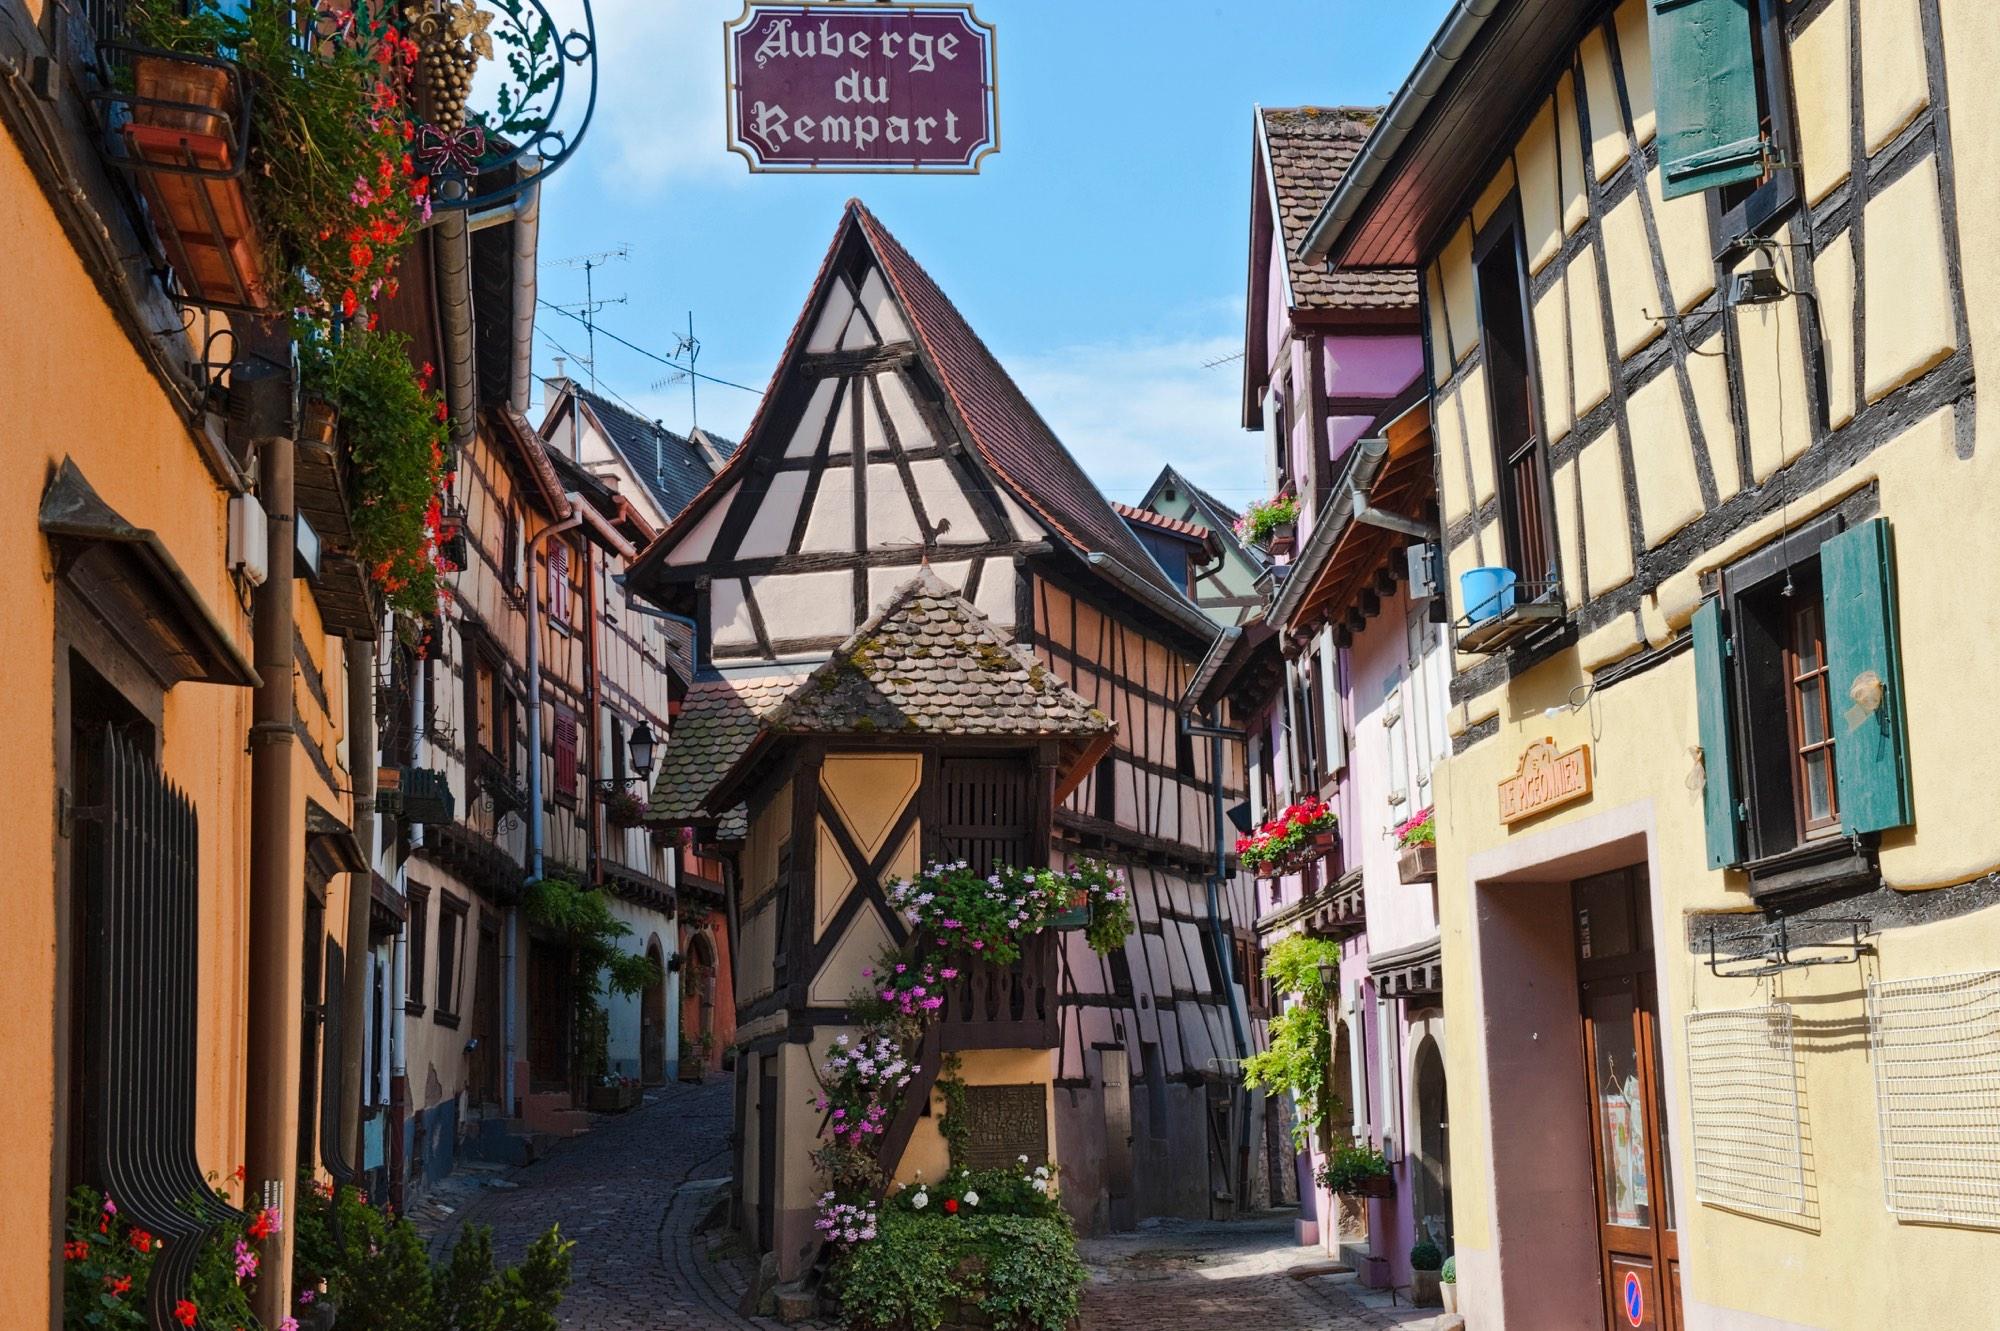 Office de tourisme d 39 eguisheim - Office du tourisme eguisheim ...